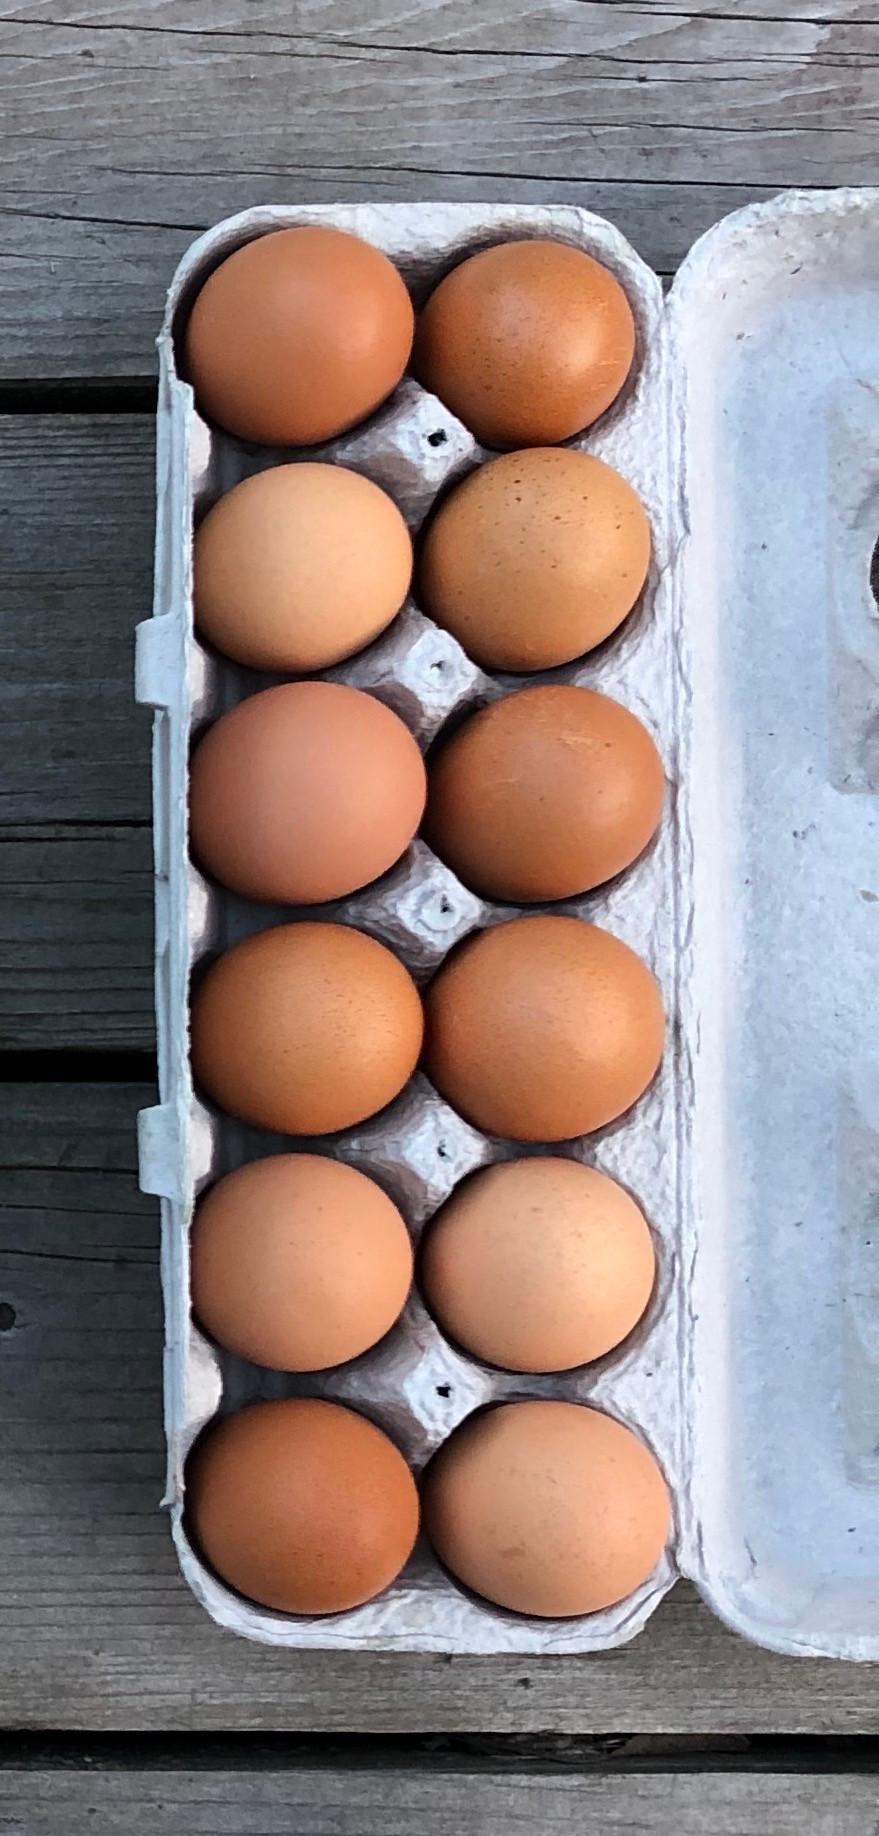 12 brown farm eggs in light grey egg carton, dark grey wood backgroun